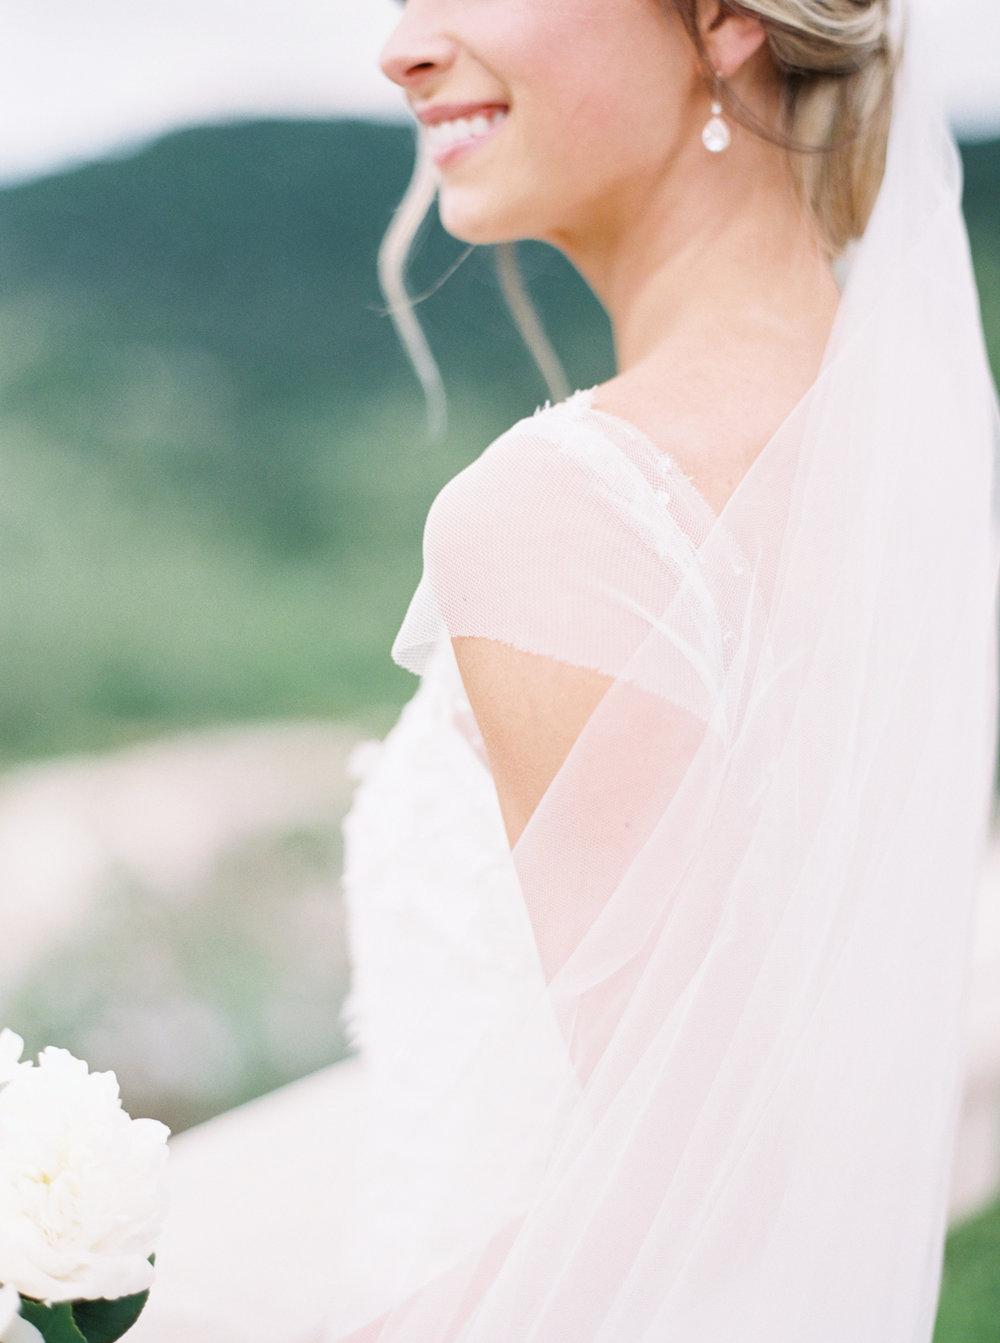 jenna-mcelroy-bridal-portraits-a-southern-tradition-13